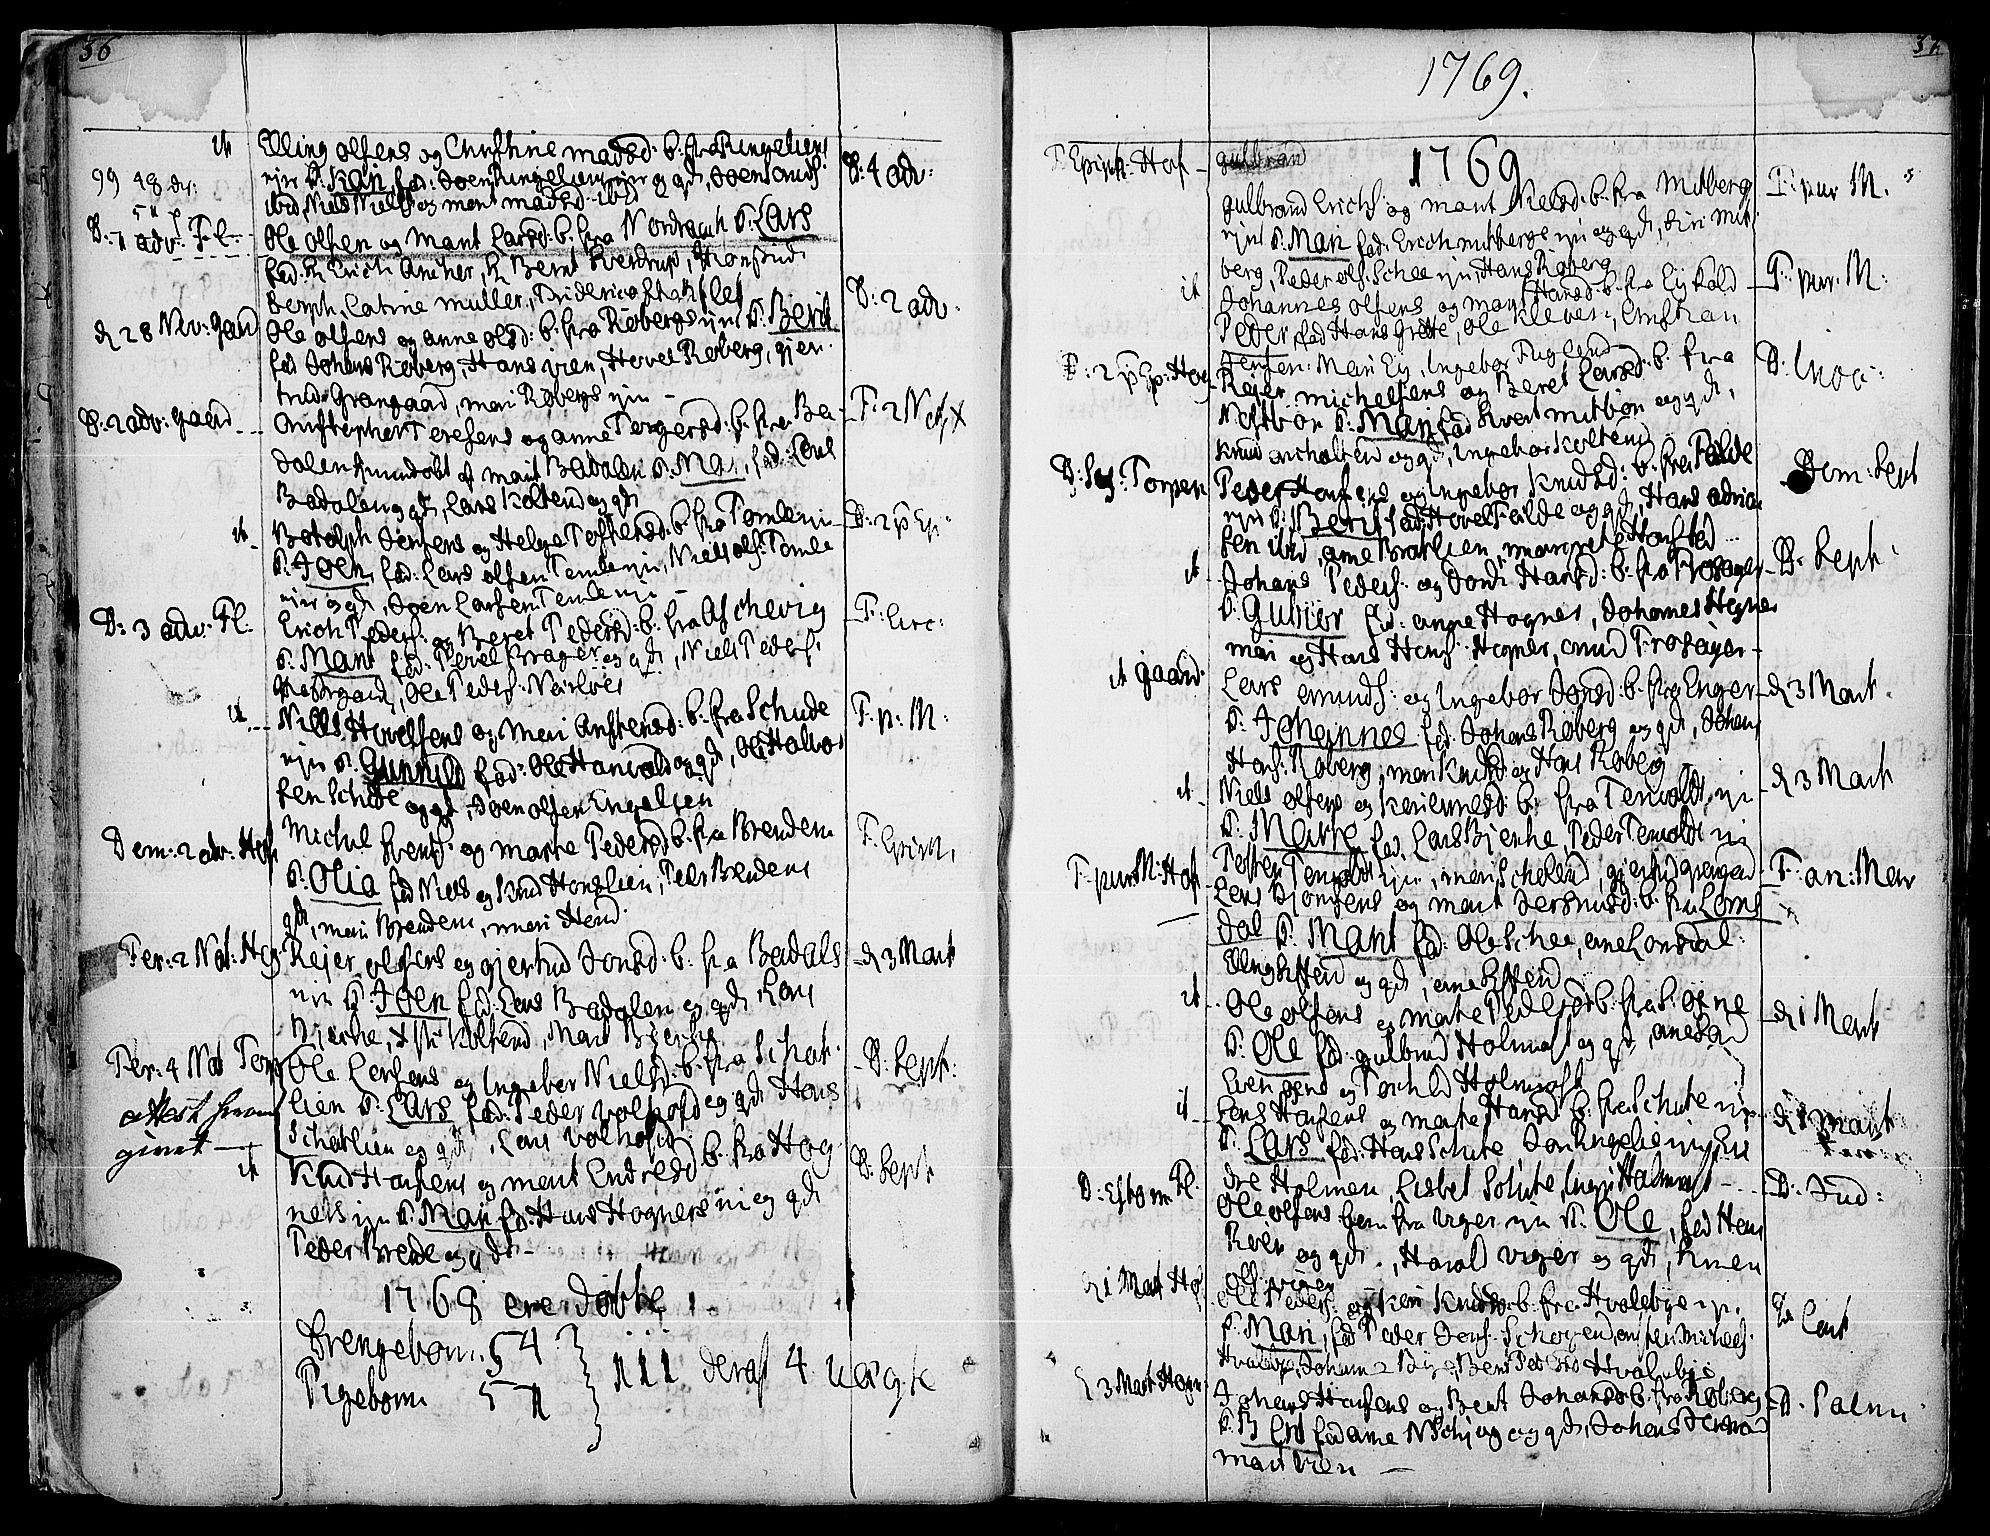 SAH, Land prestekontor, Ministerialbok nr. 5, 1765-1784, s. 36-37